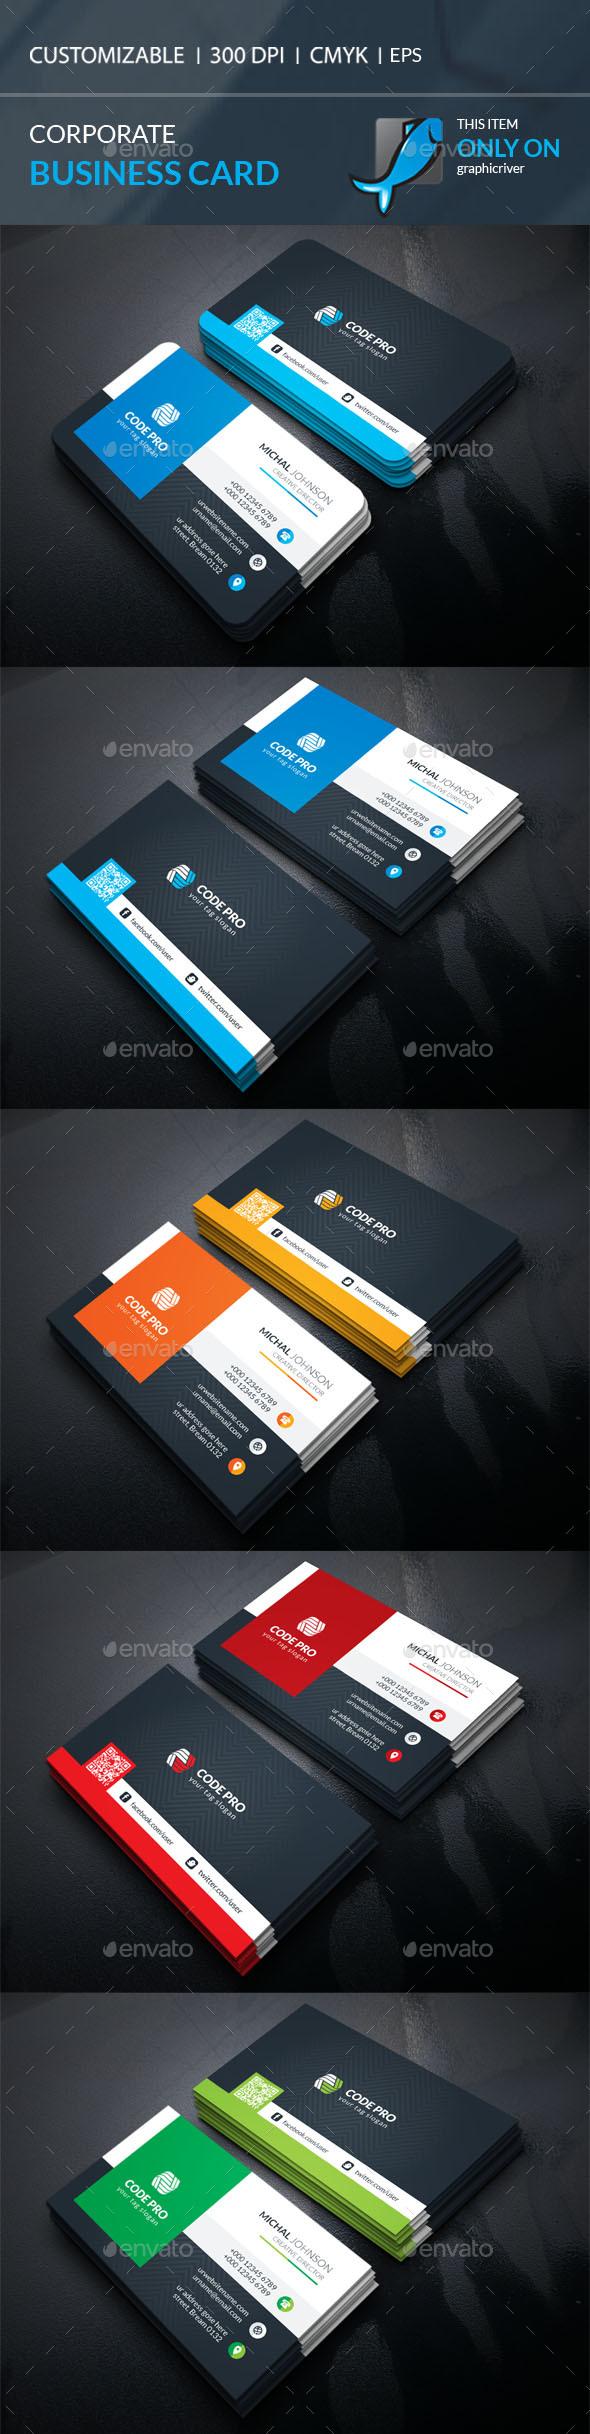 Business Card Template Vector EPS, AI Illustrator | Business Card ...